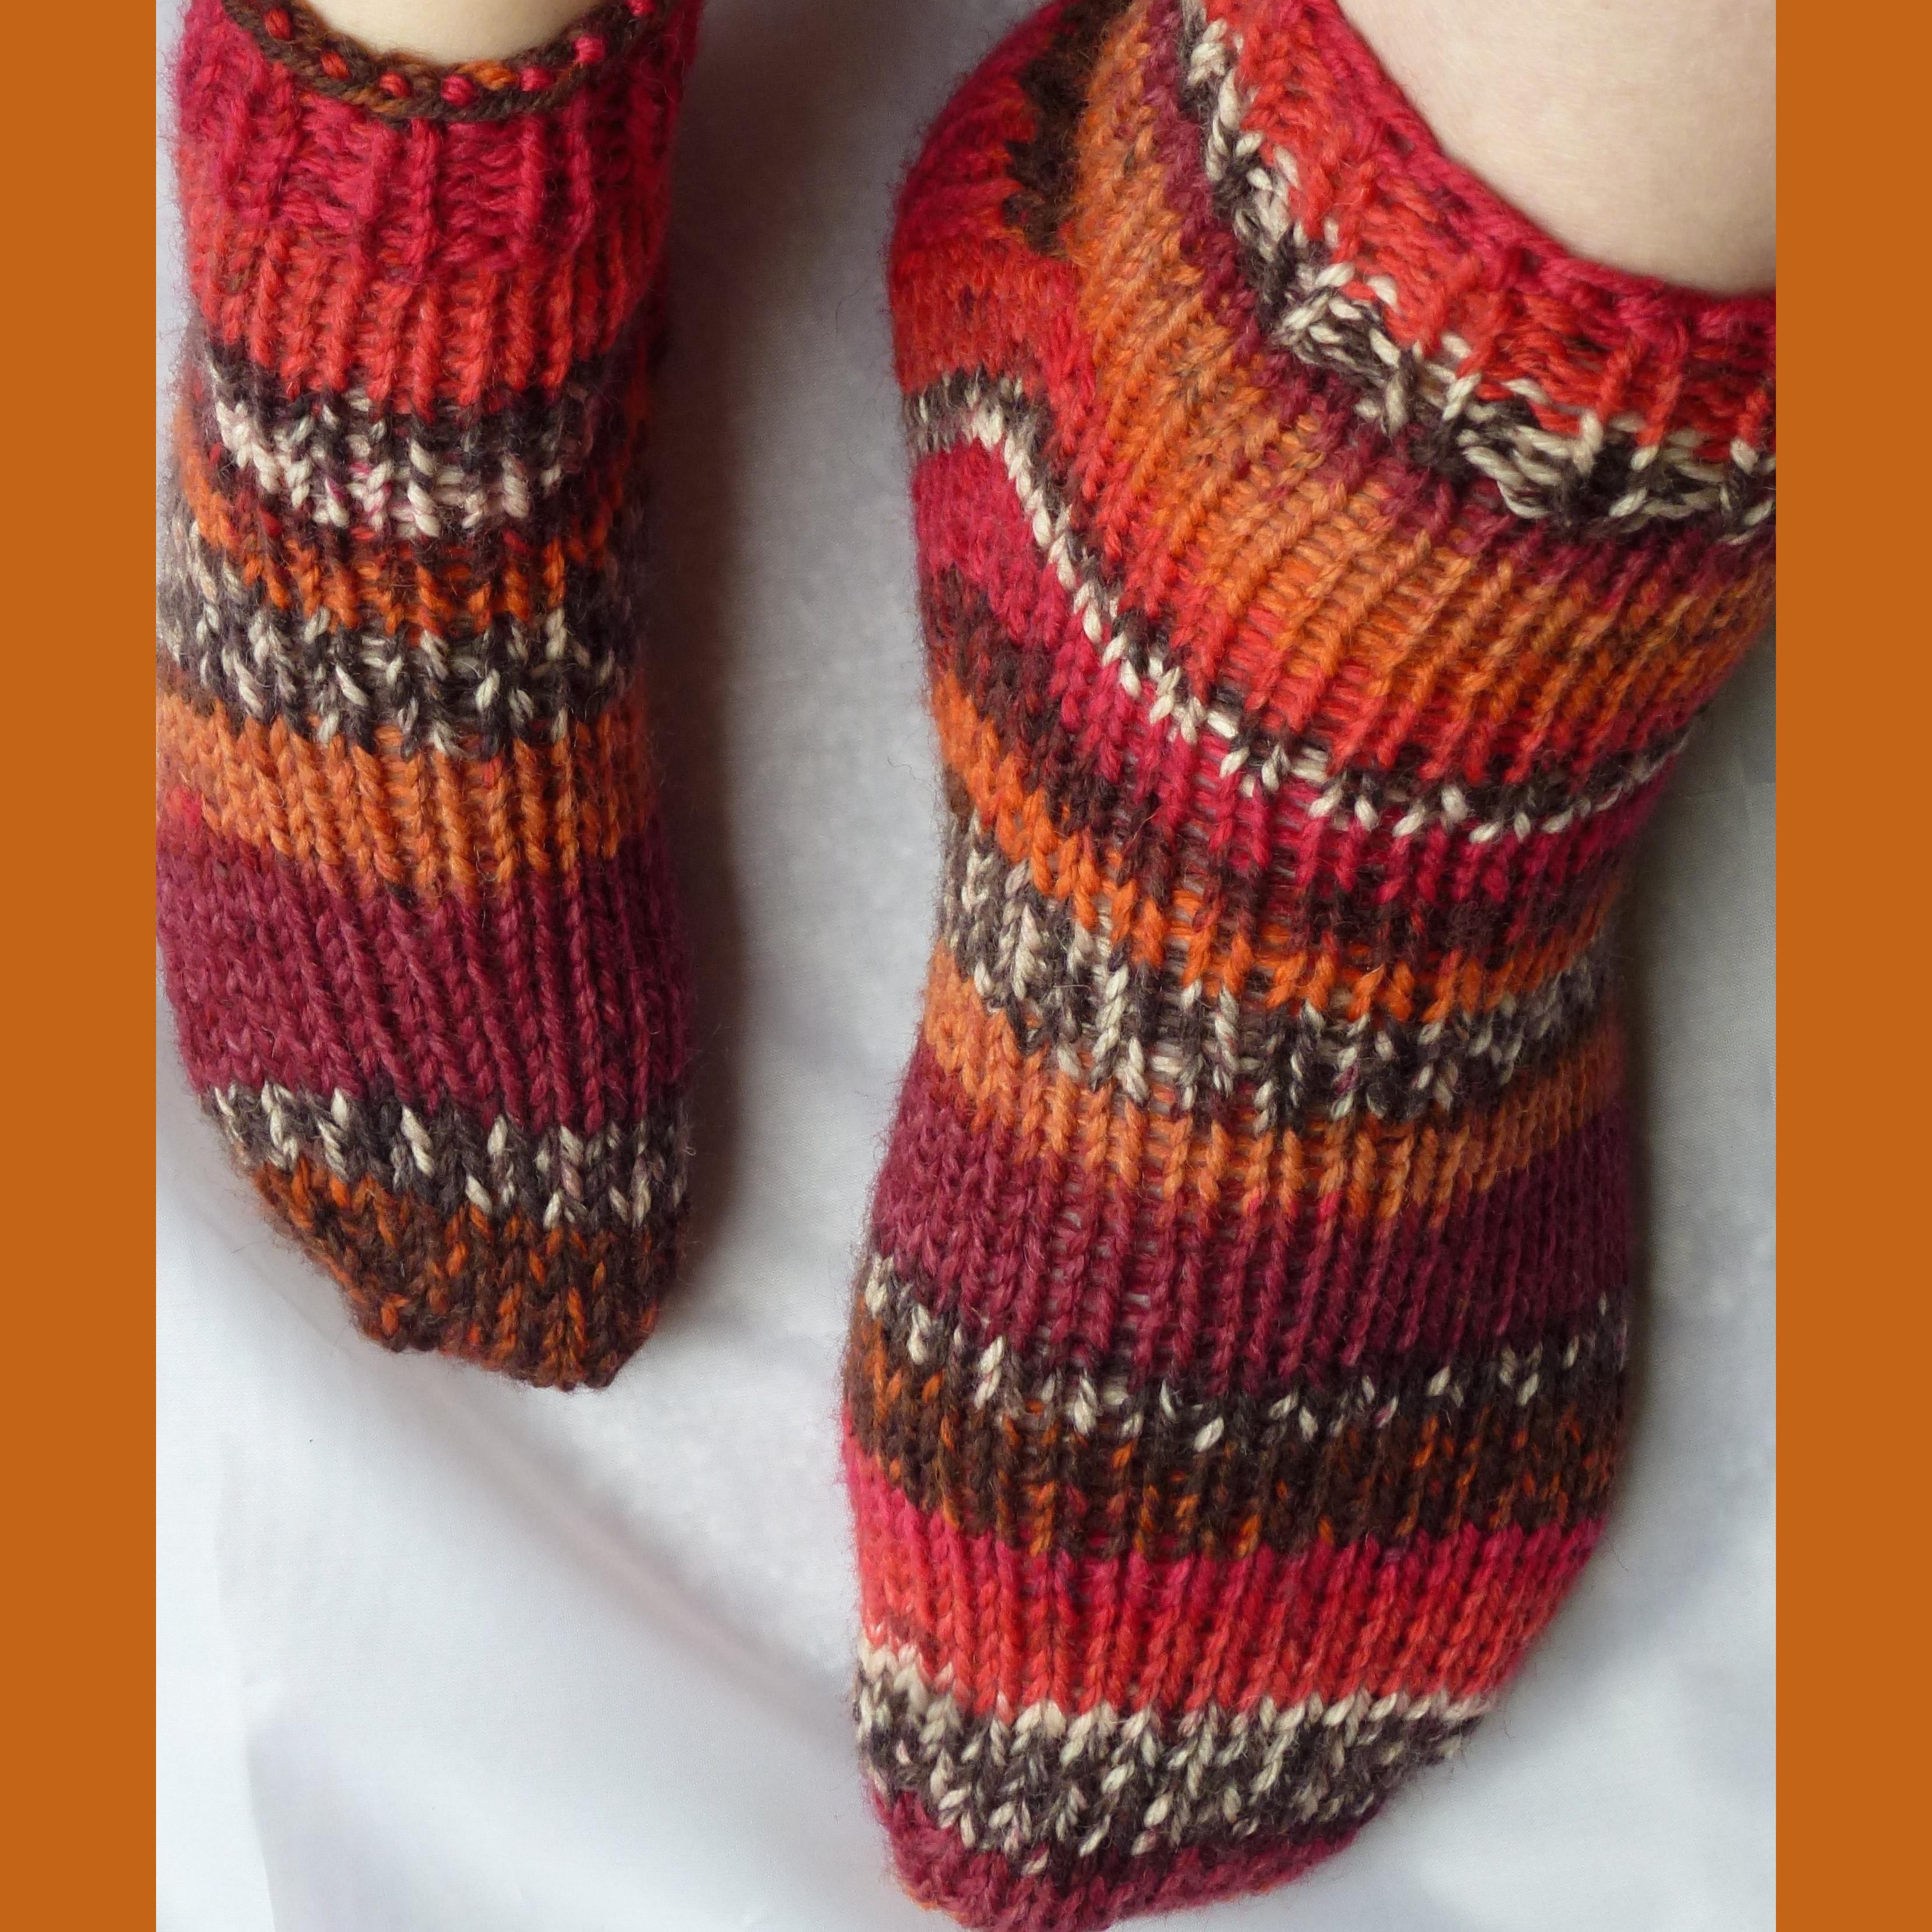 520 Socks 2